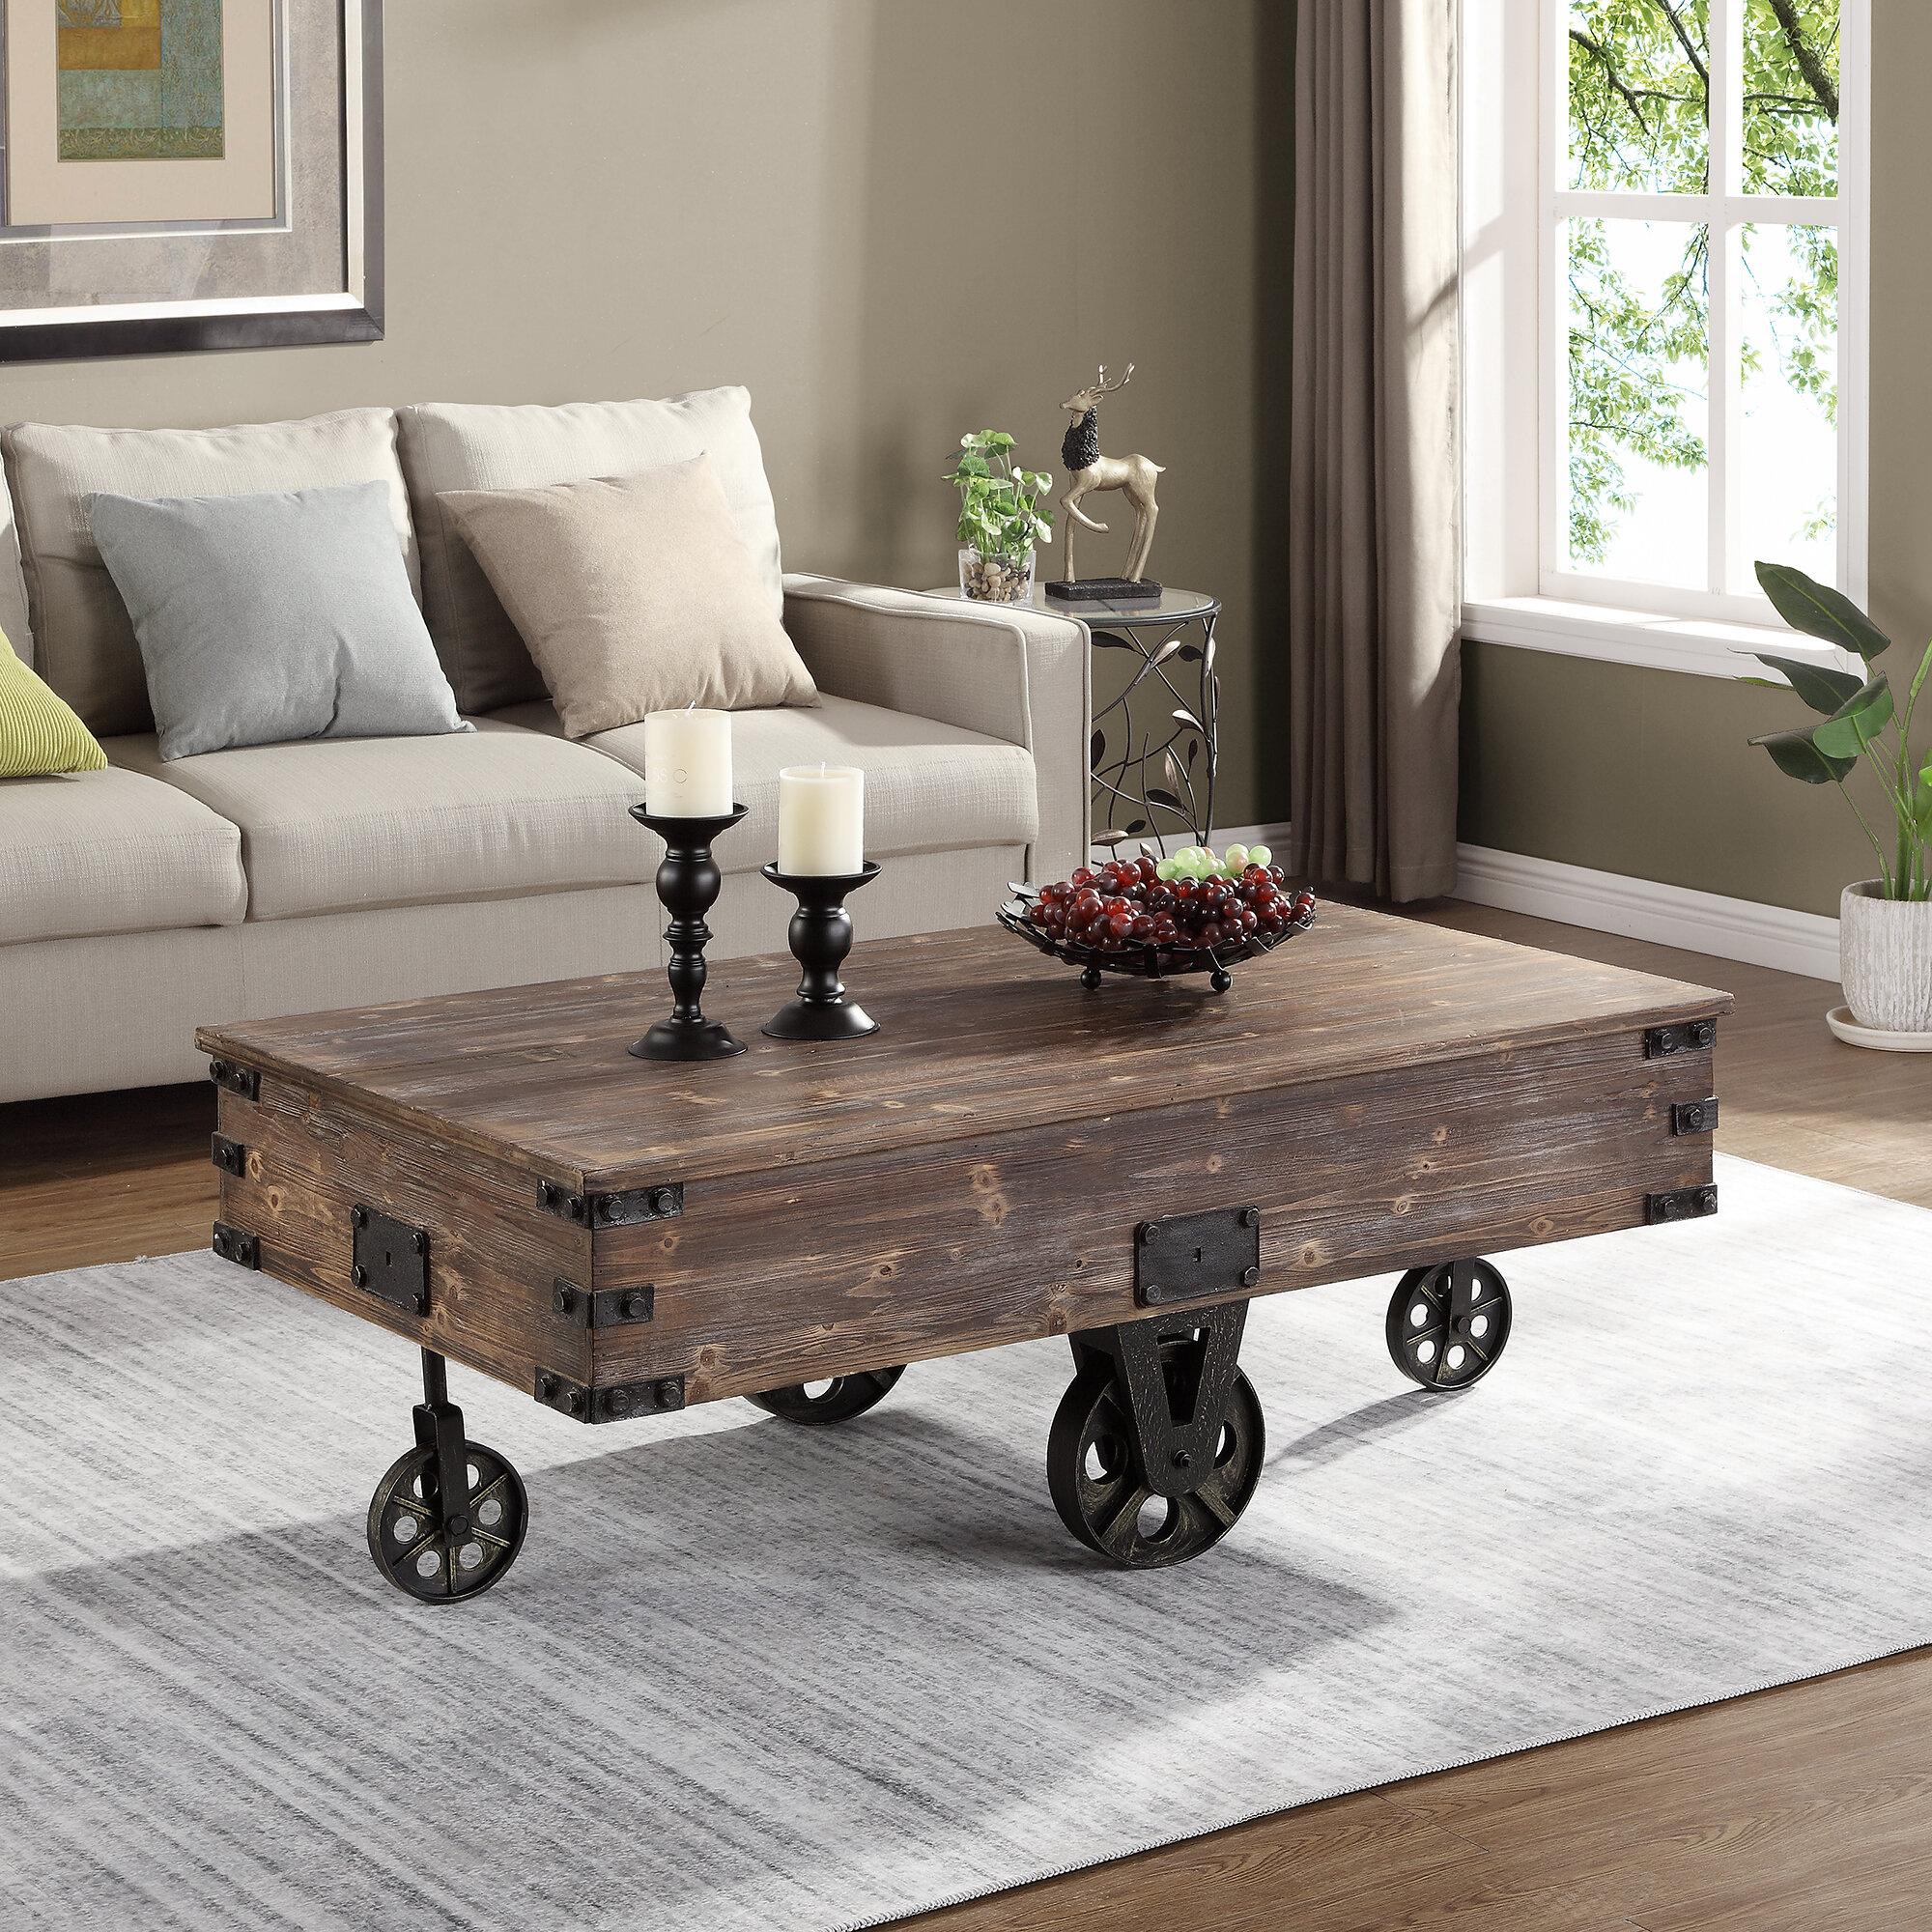 Gracie Oaks Epp Wheel Coffee Table Reviews Wayfair